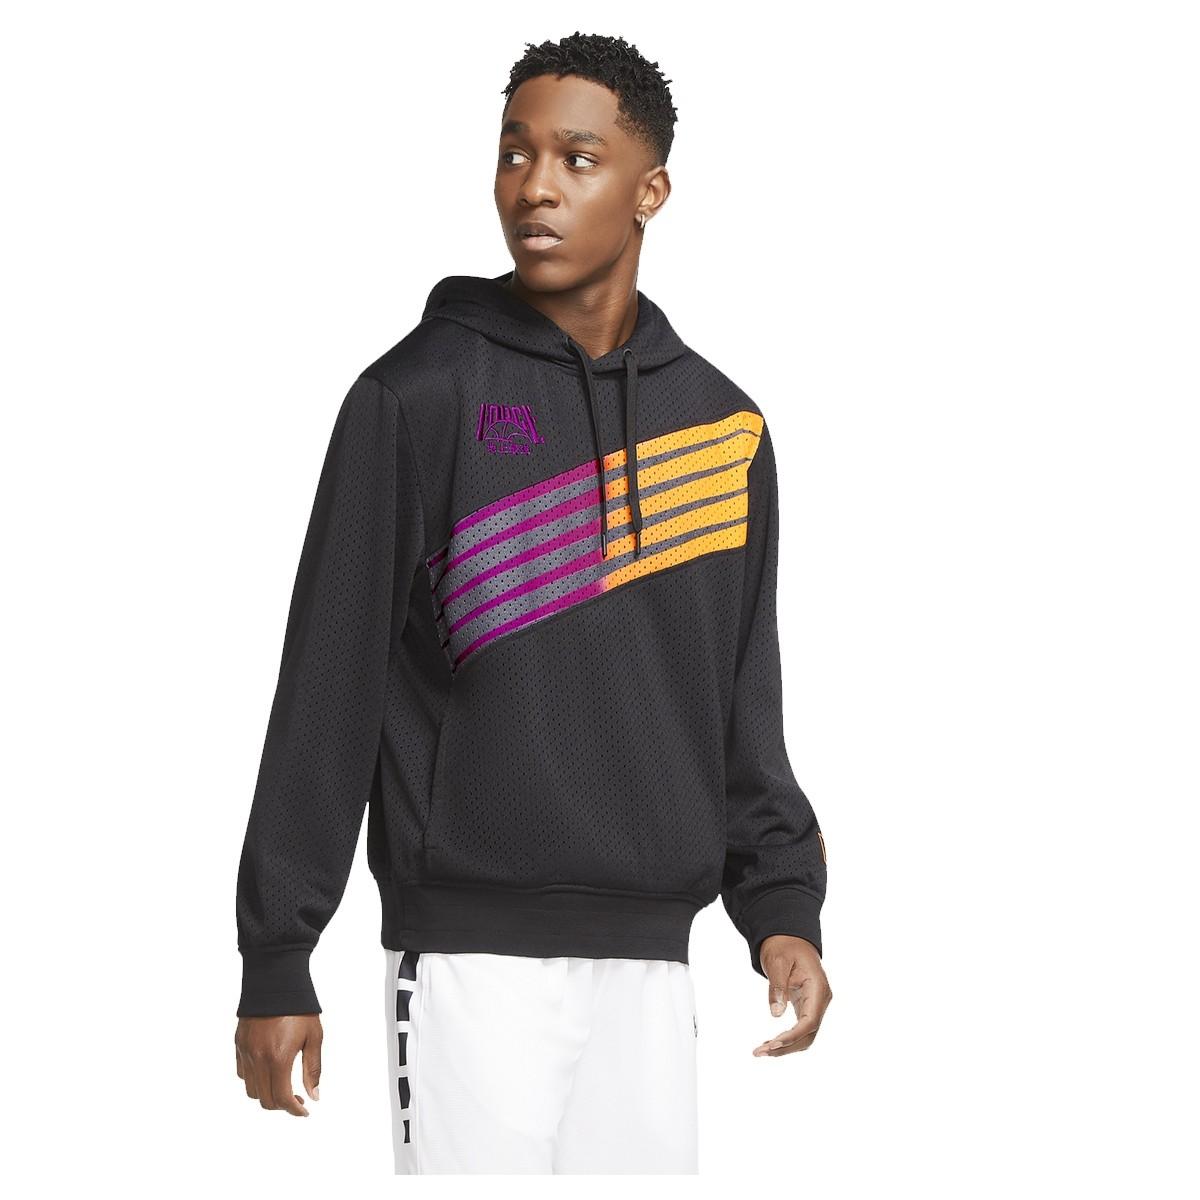 Sudadera Nike KMA 'Black'-CK6388-010